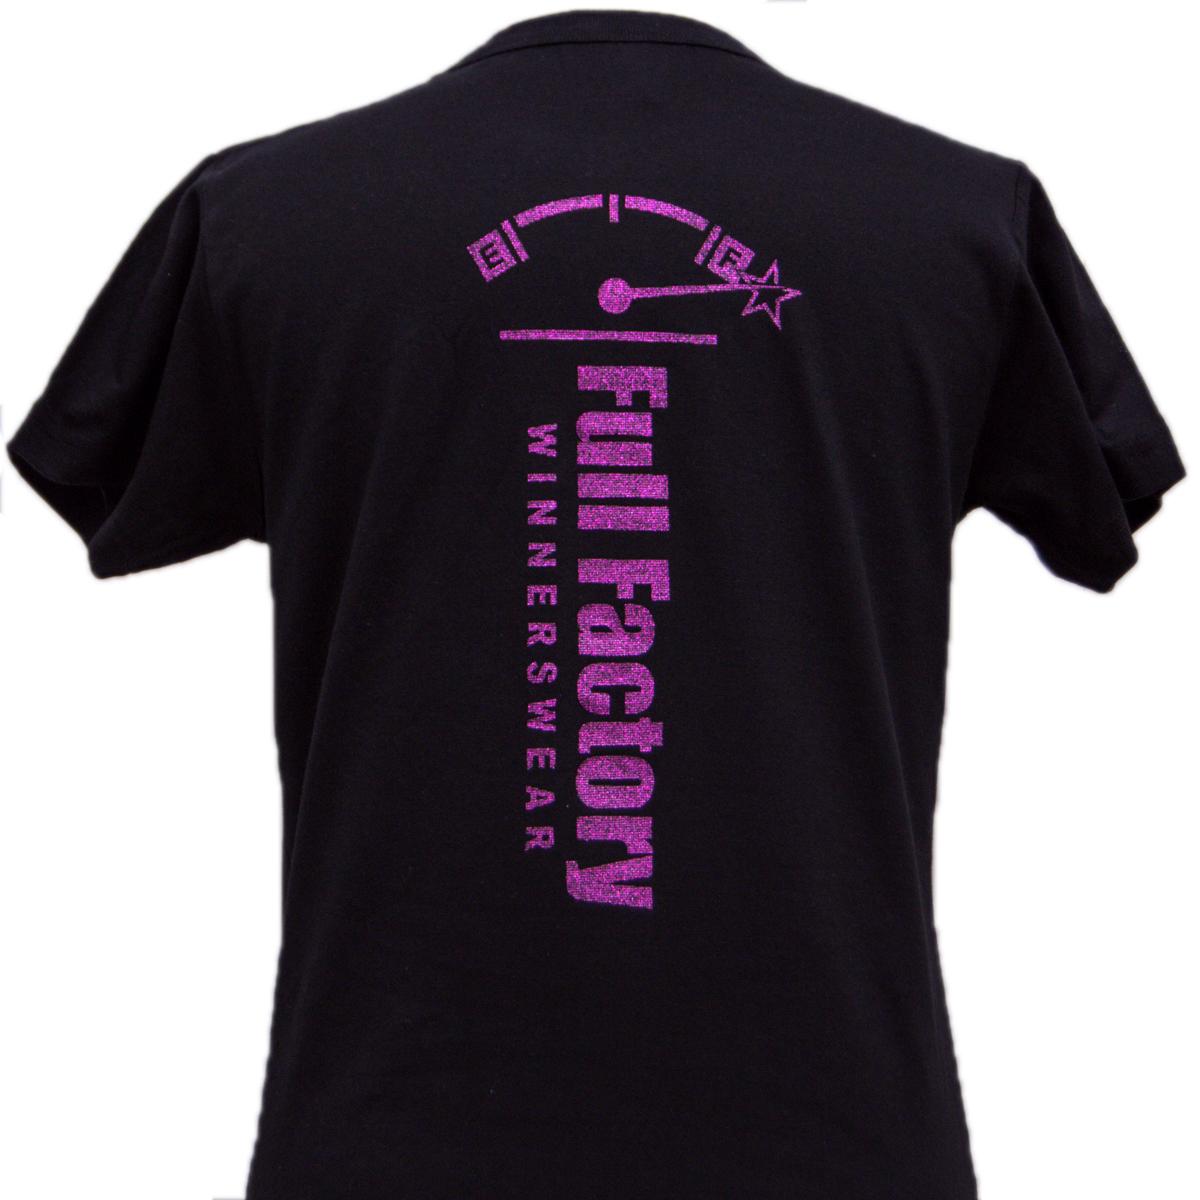 Ladies Full Factory Black & Glitter T-Shirt Image (Back)